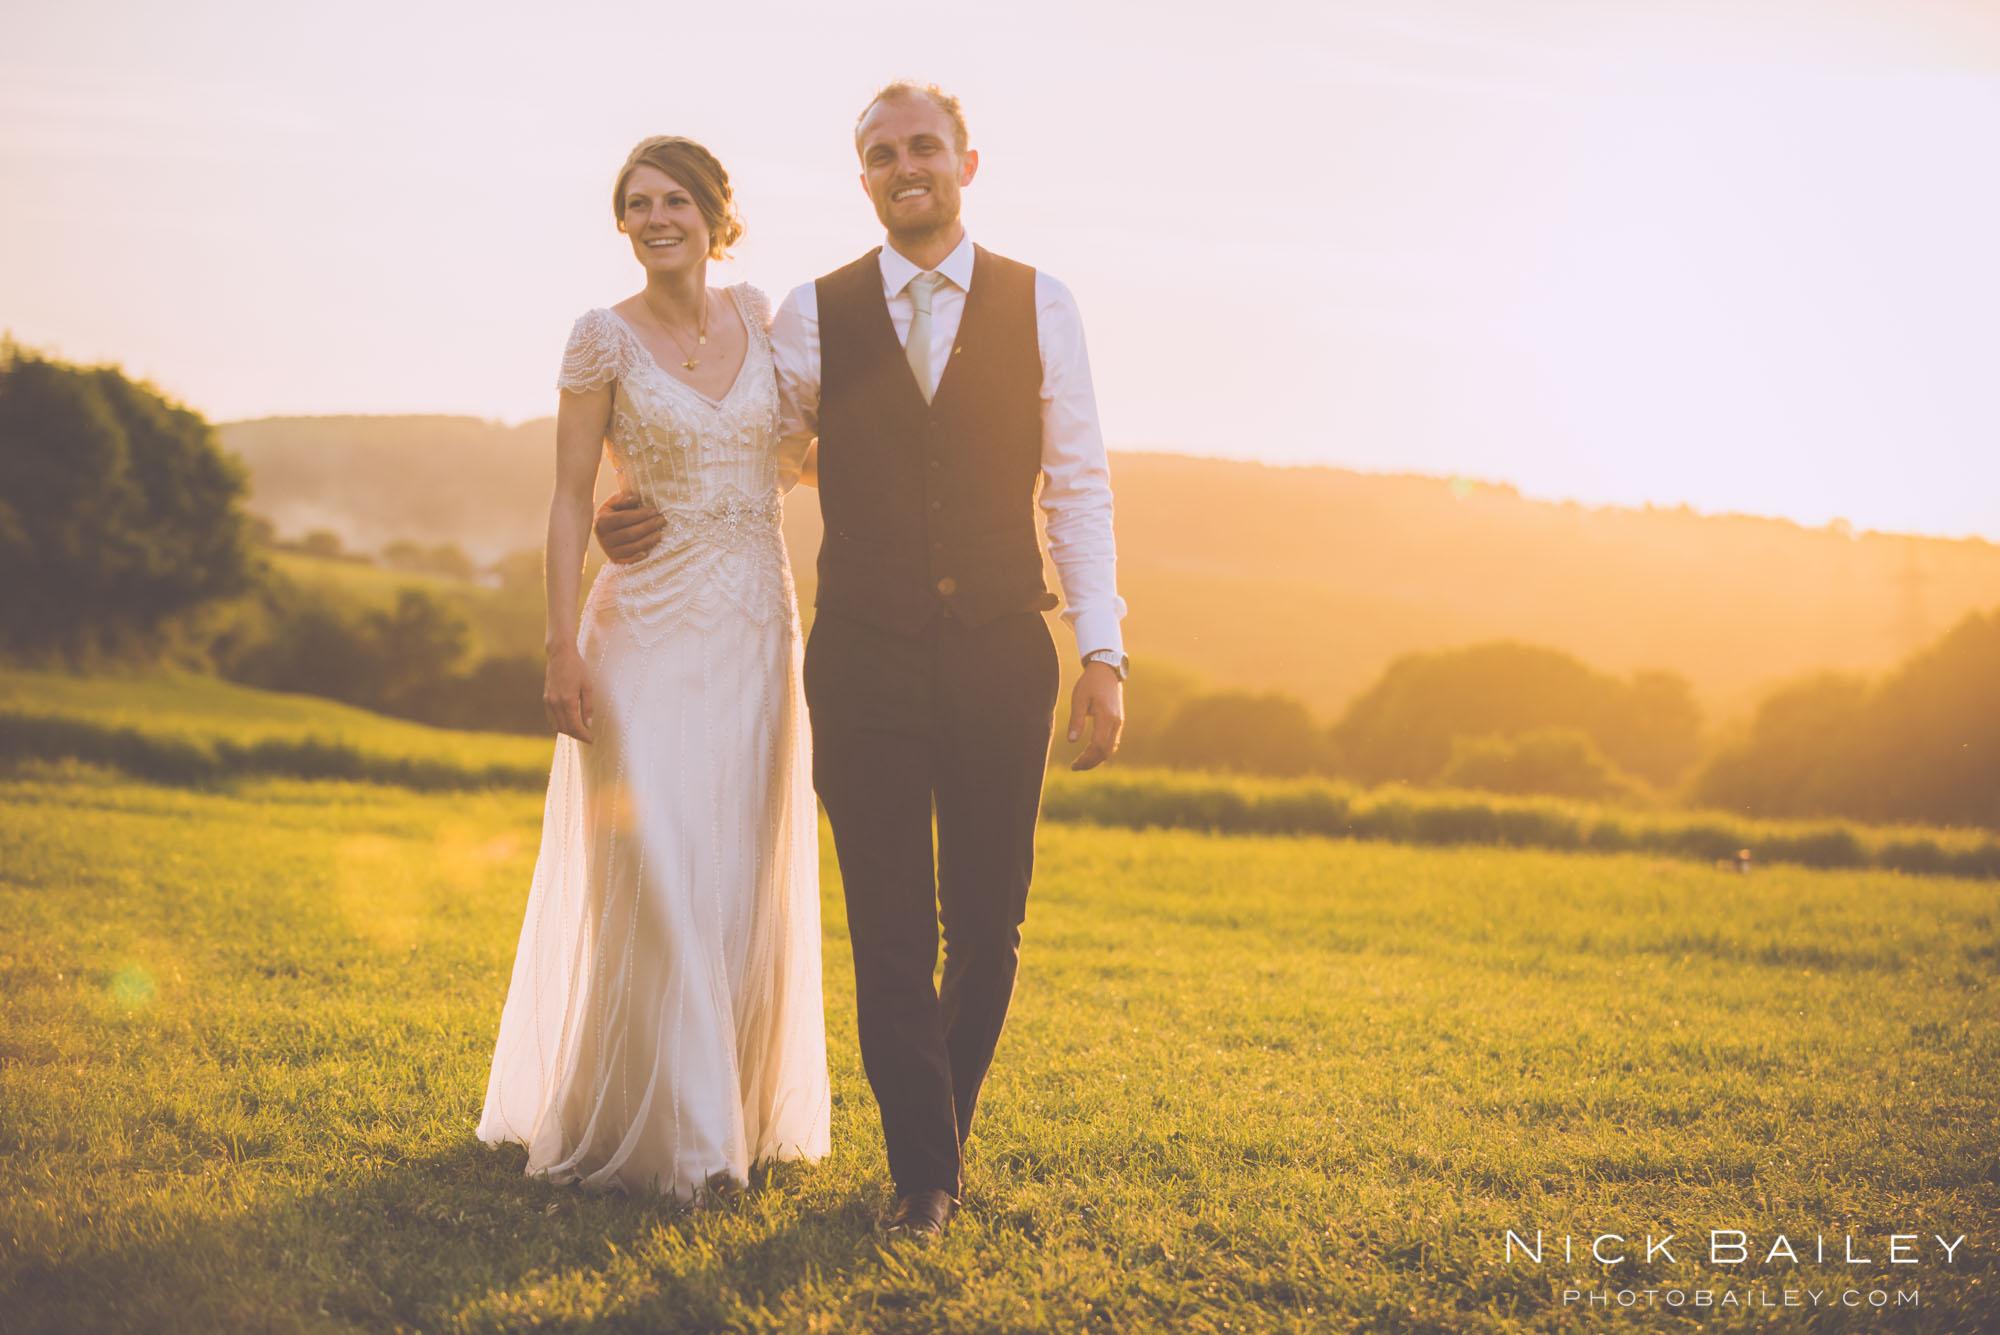 wedding-photographer-bodmin-105.jpg